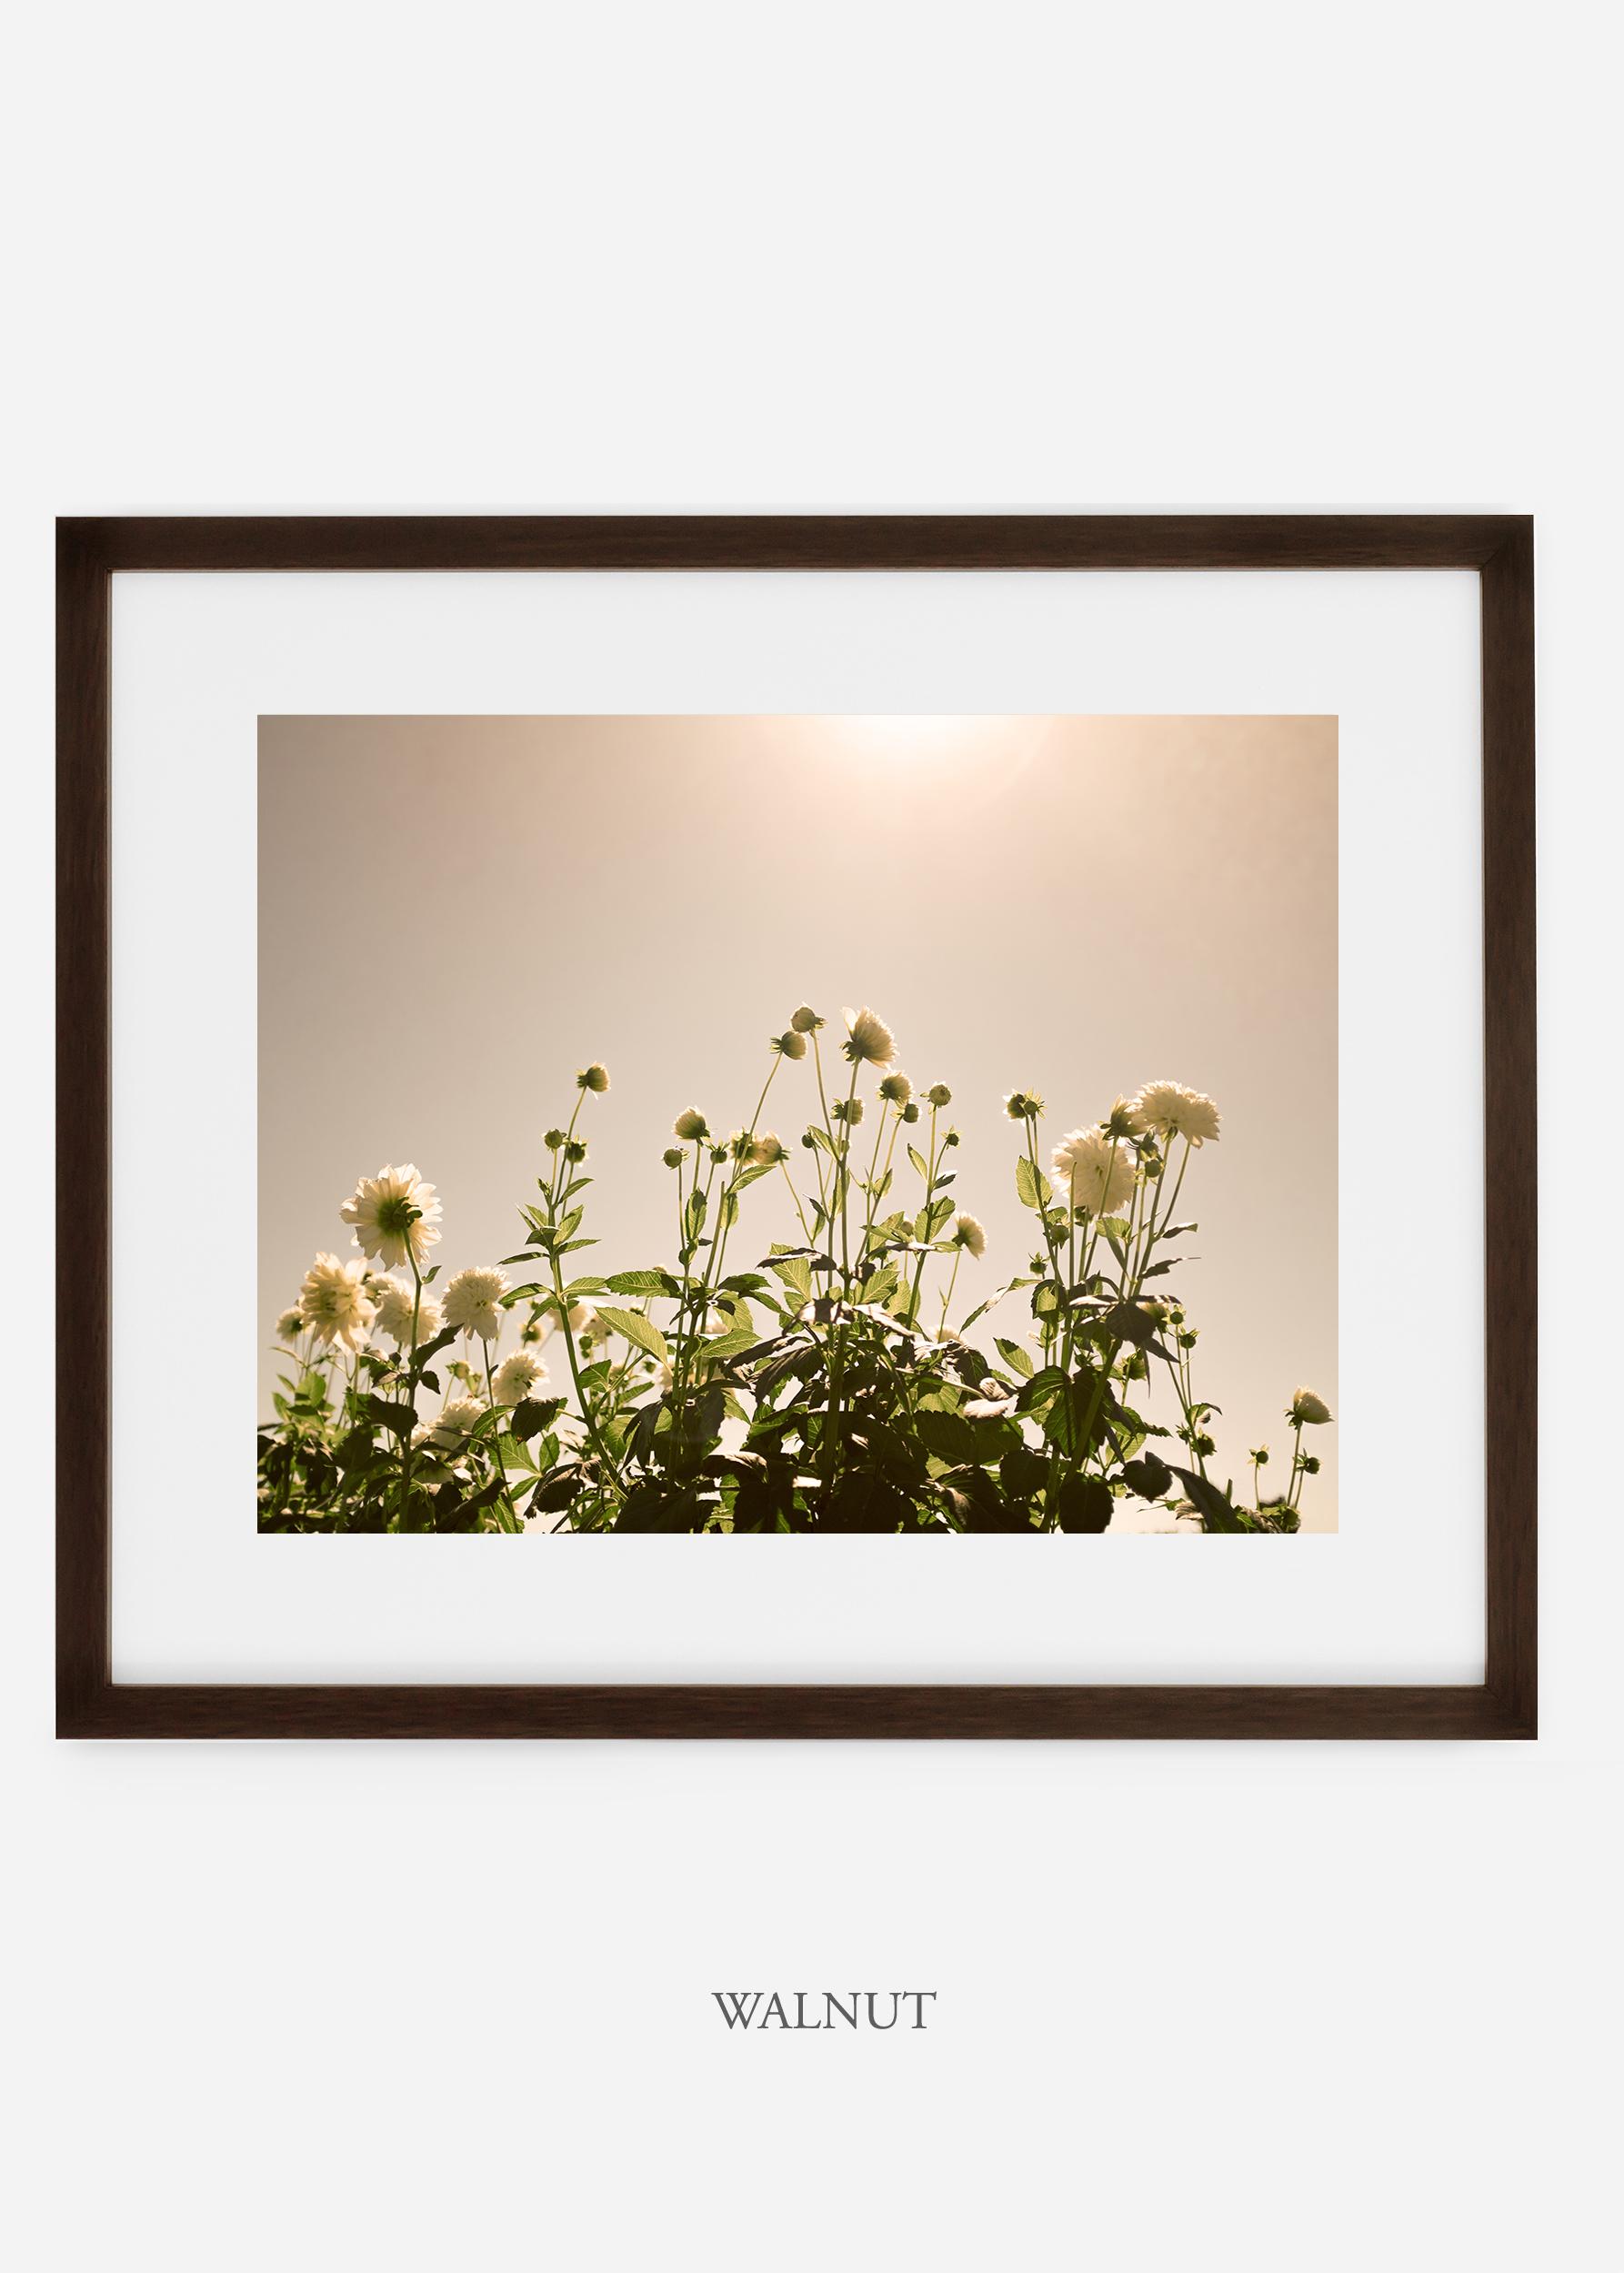 wilder-california-walnutframe-dahlia-7-minimal-botanical-print-art-interior-design.jpg